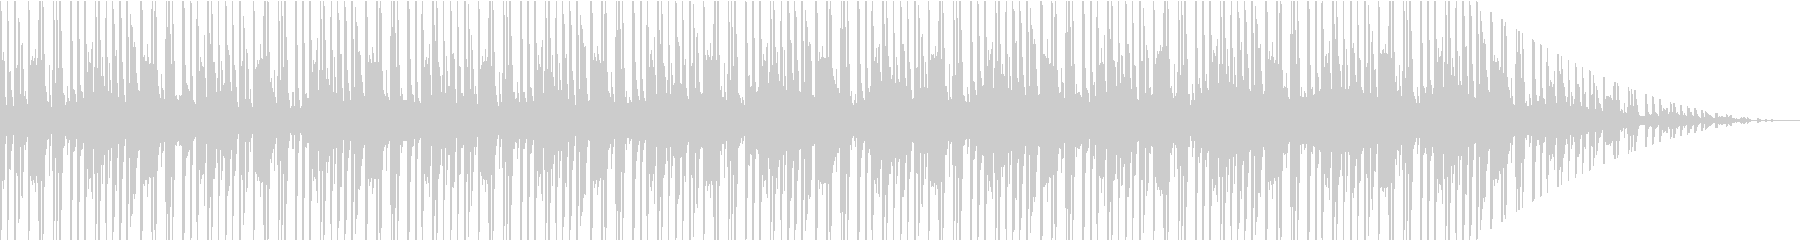 80s シンセサウンドの未再生の波形